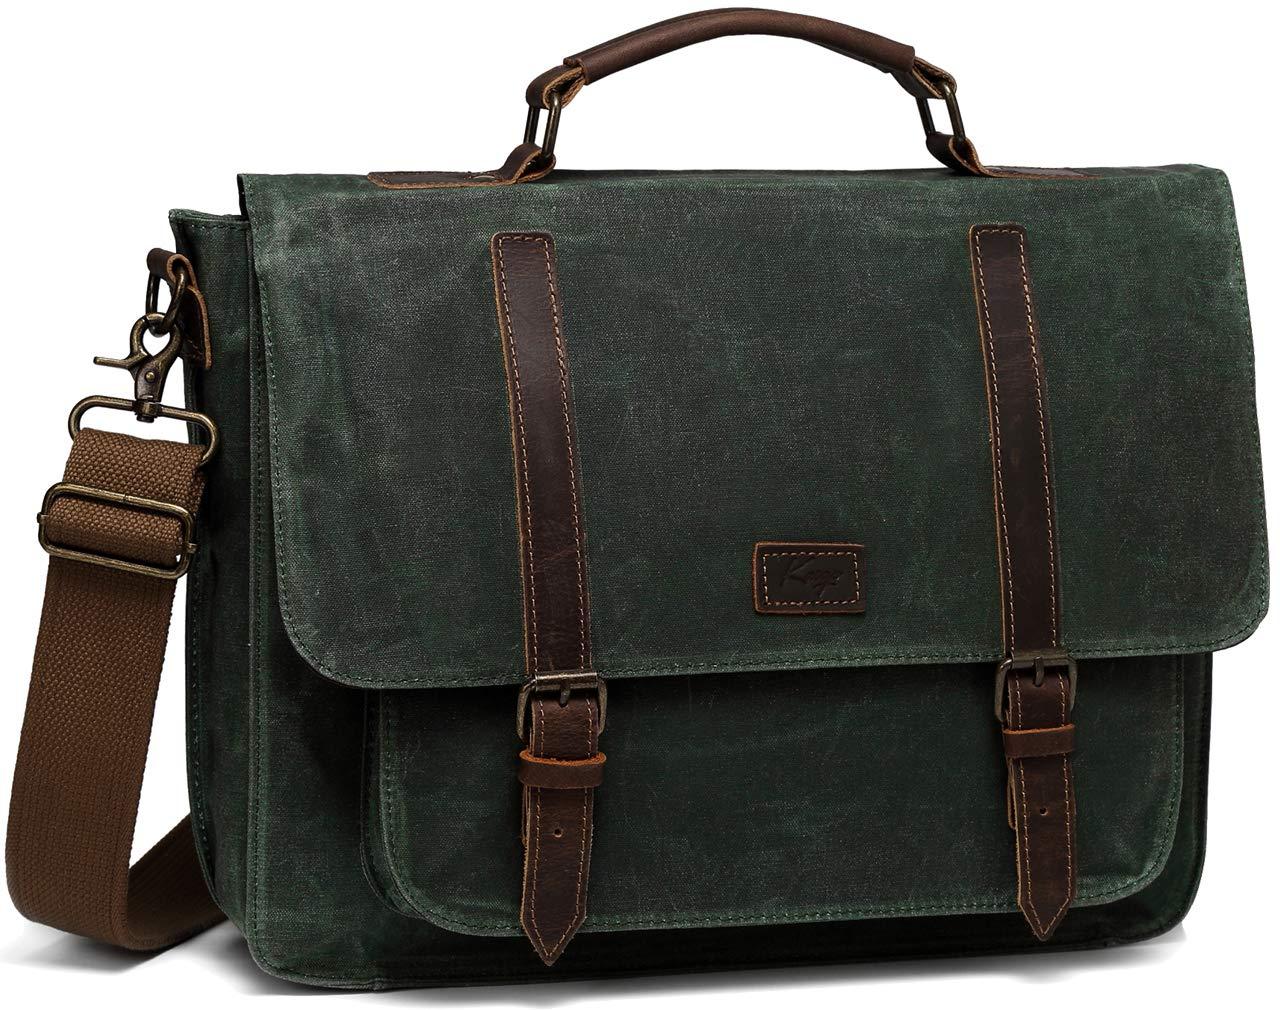 Leather Messenger Bag Mens, Kasgo Water Resistant Waxed Canvas Briefcase Vintage Crossbody Shoulder Bag Leather Satchel Black with 15.6 inch Laptop Sleeve